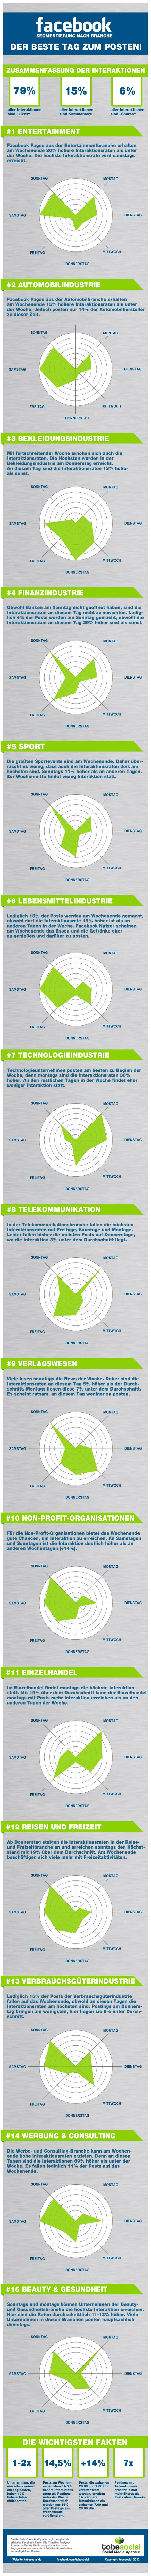 Infografik ? Strategien für Facebook-Postings nach Branche (Social Media Agentur tobesocial)